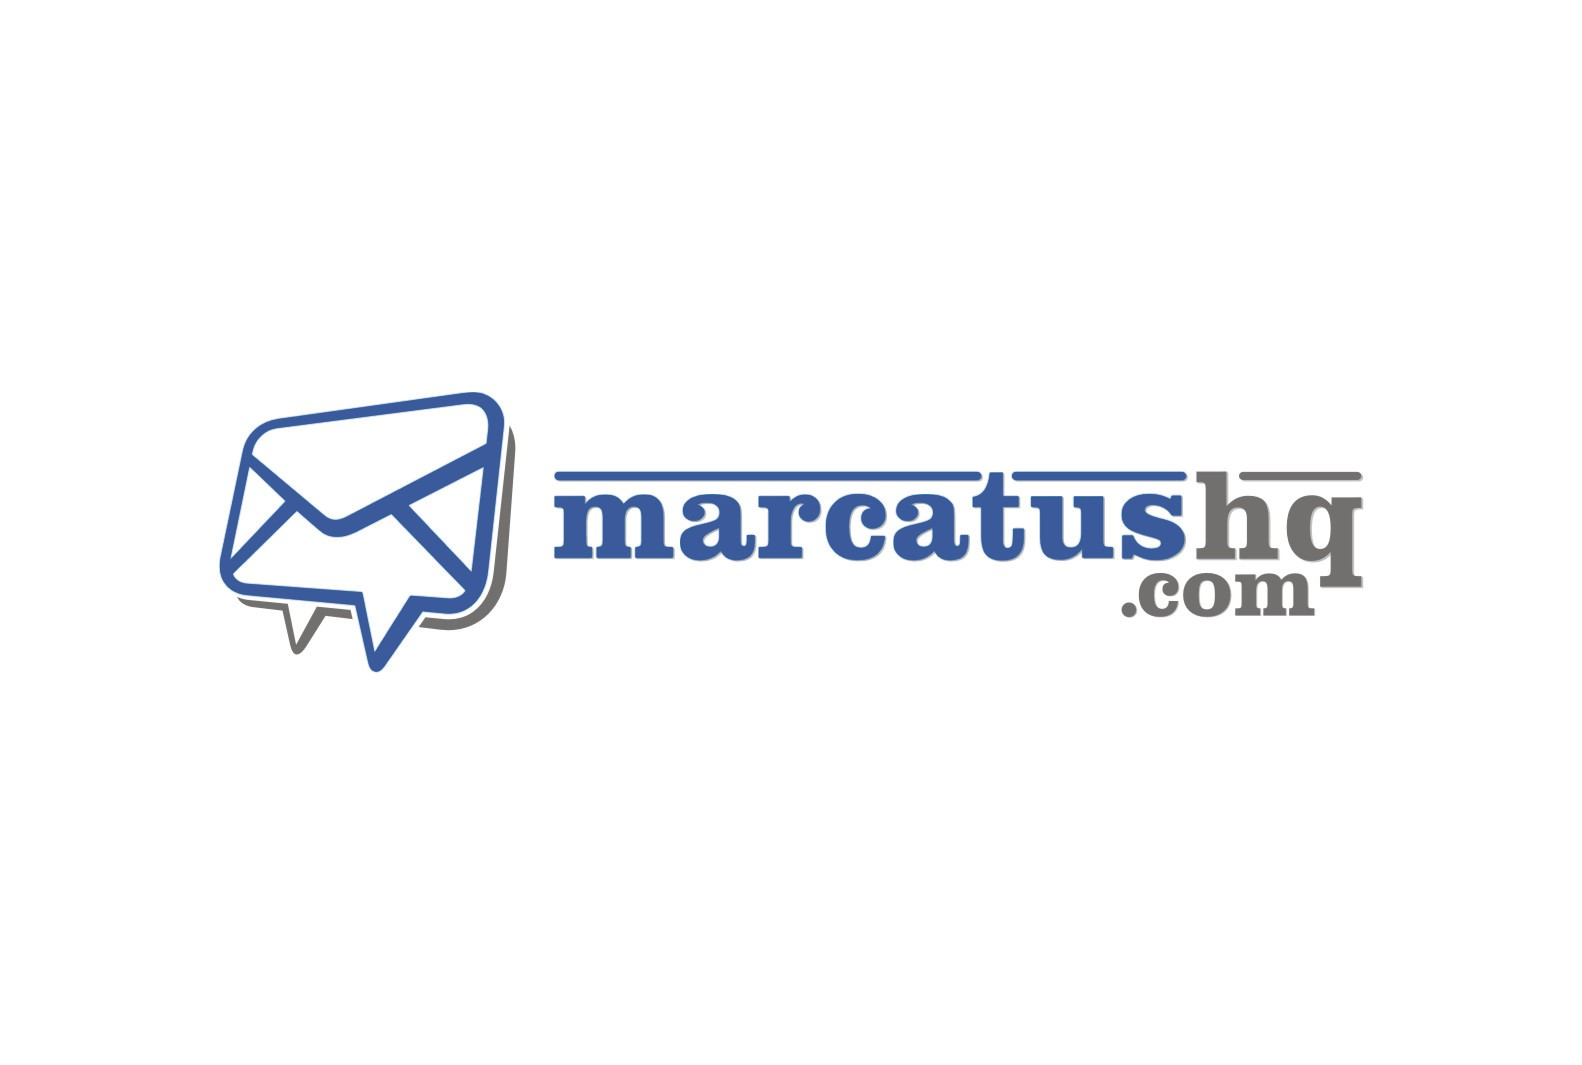 Marcatus needs a logo update